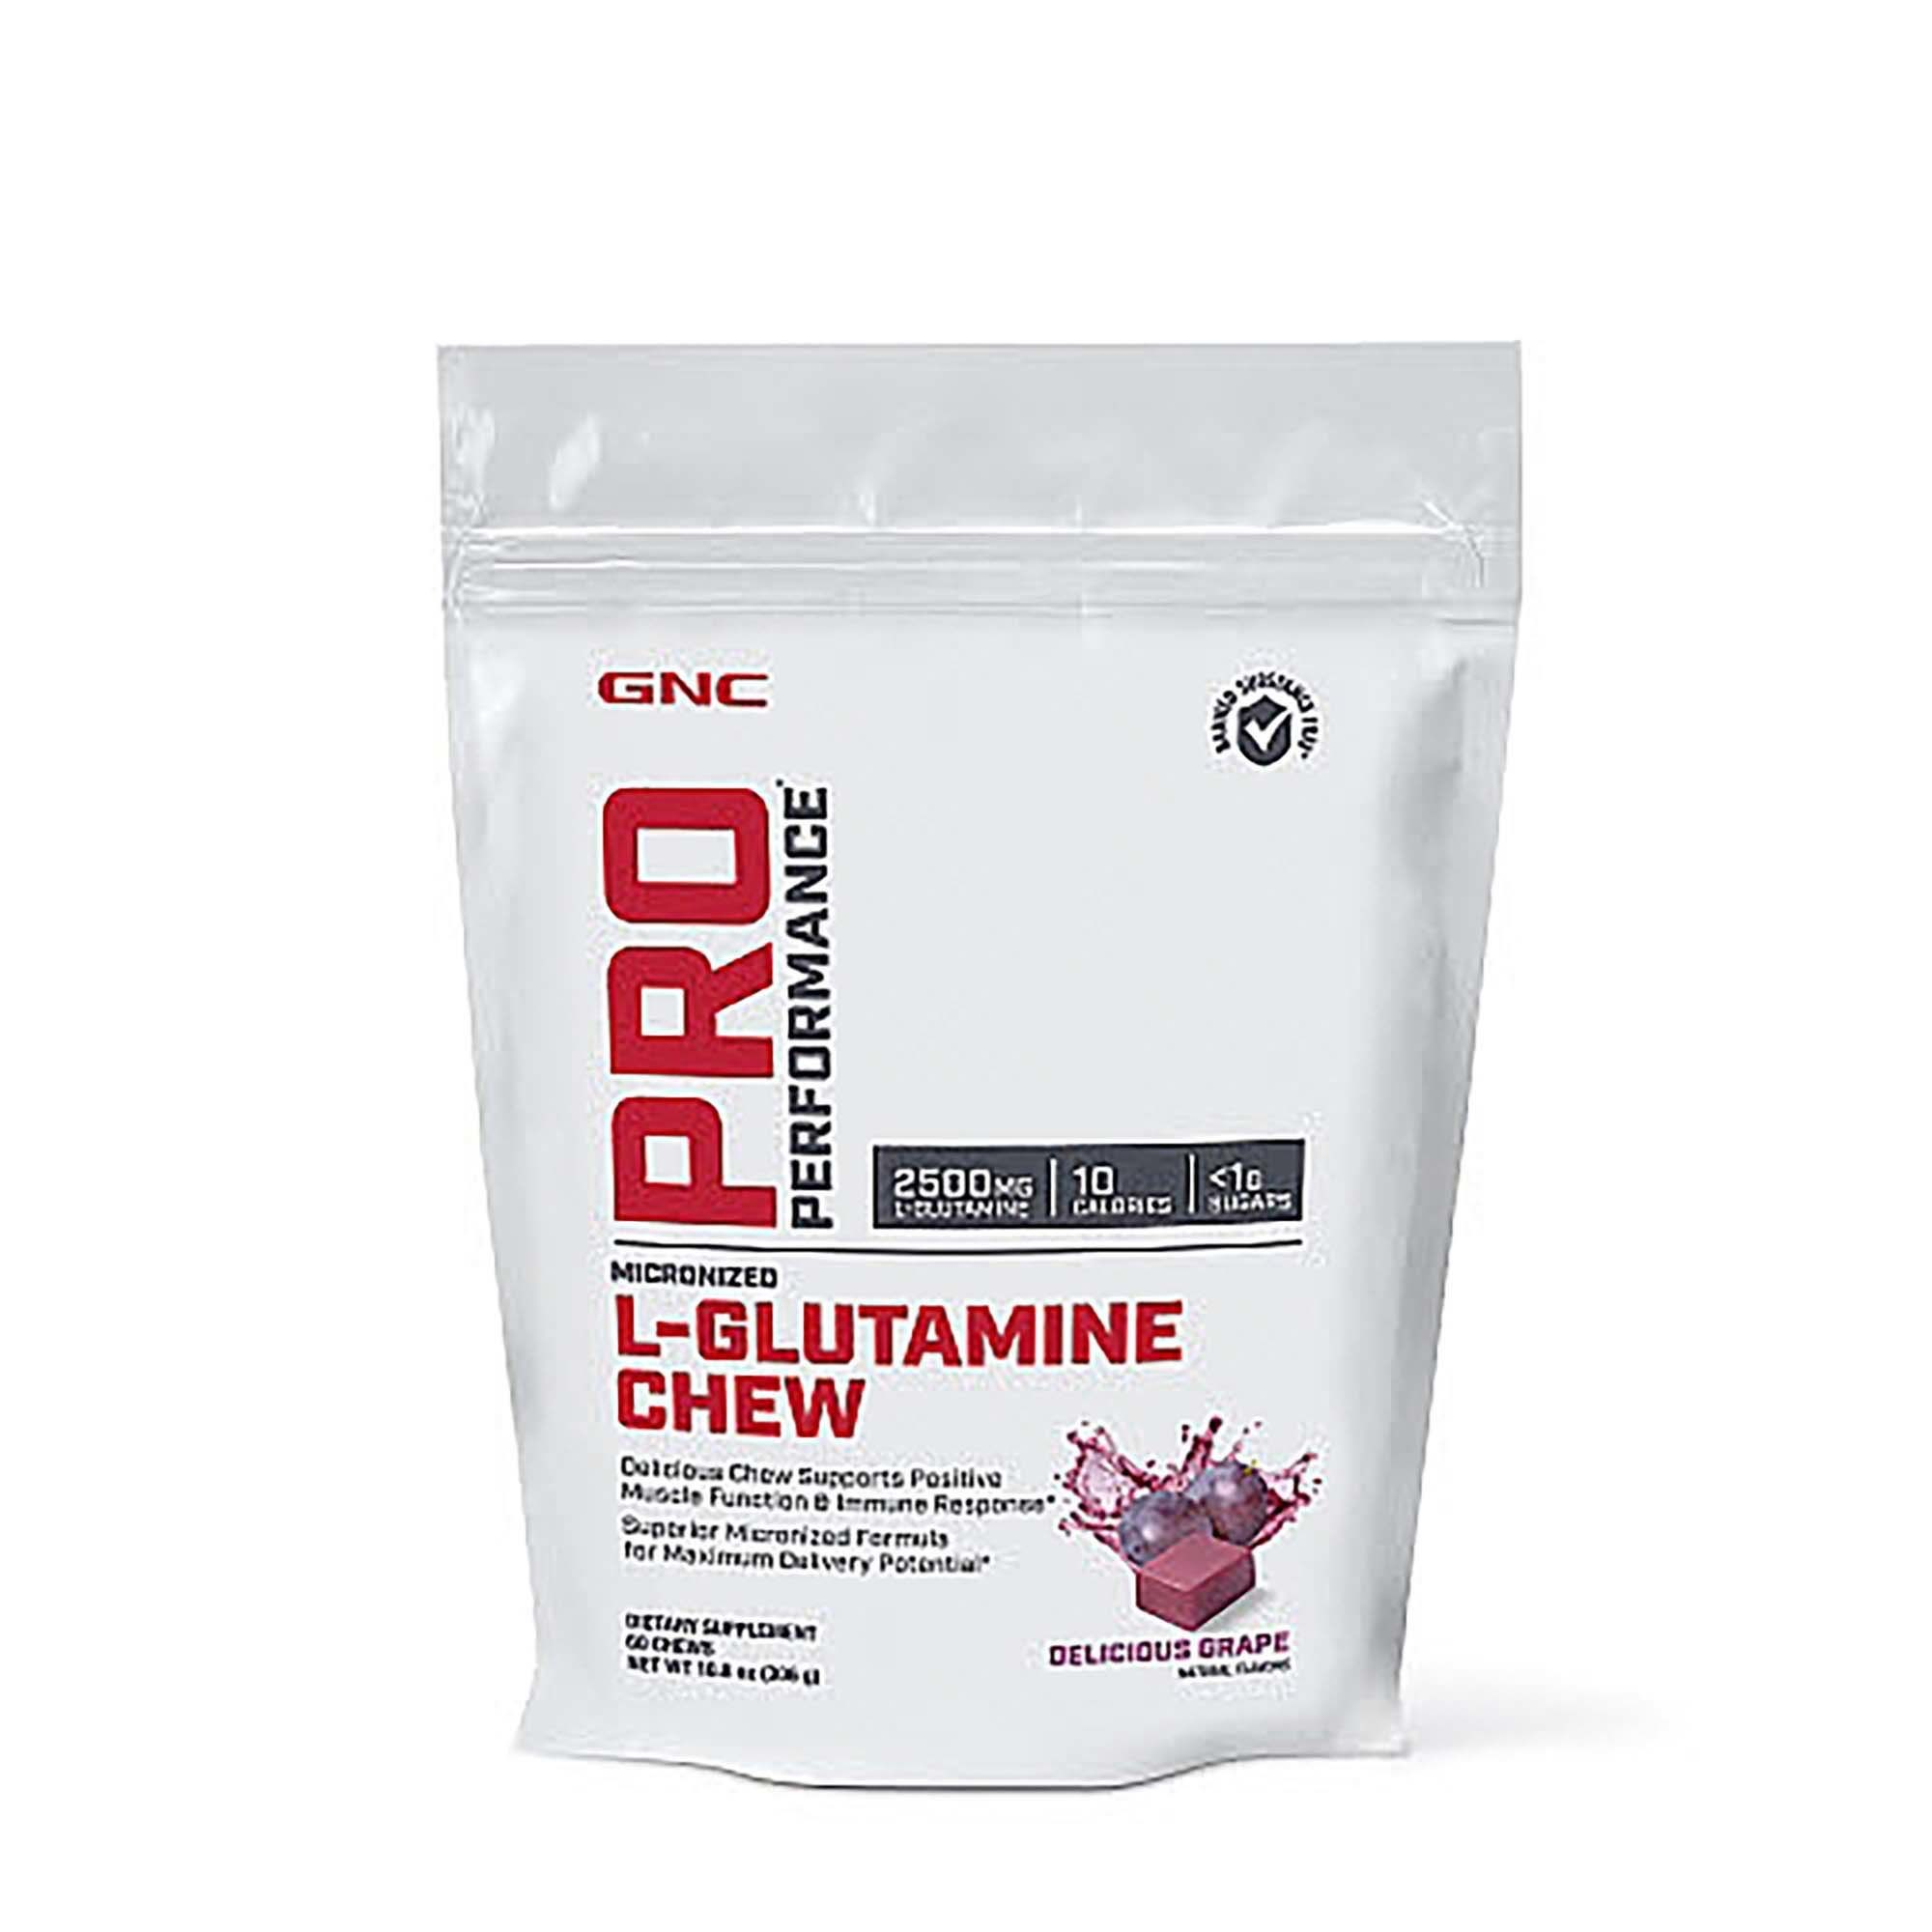 GNC Pro Performance®  L-Glutamine Chew, Glutamina 2500 mg, Aroma de Struguri, 60 Caramele